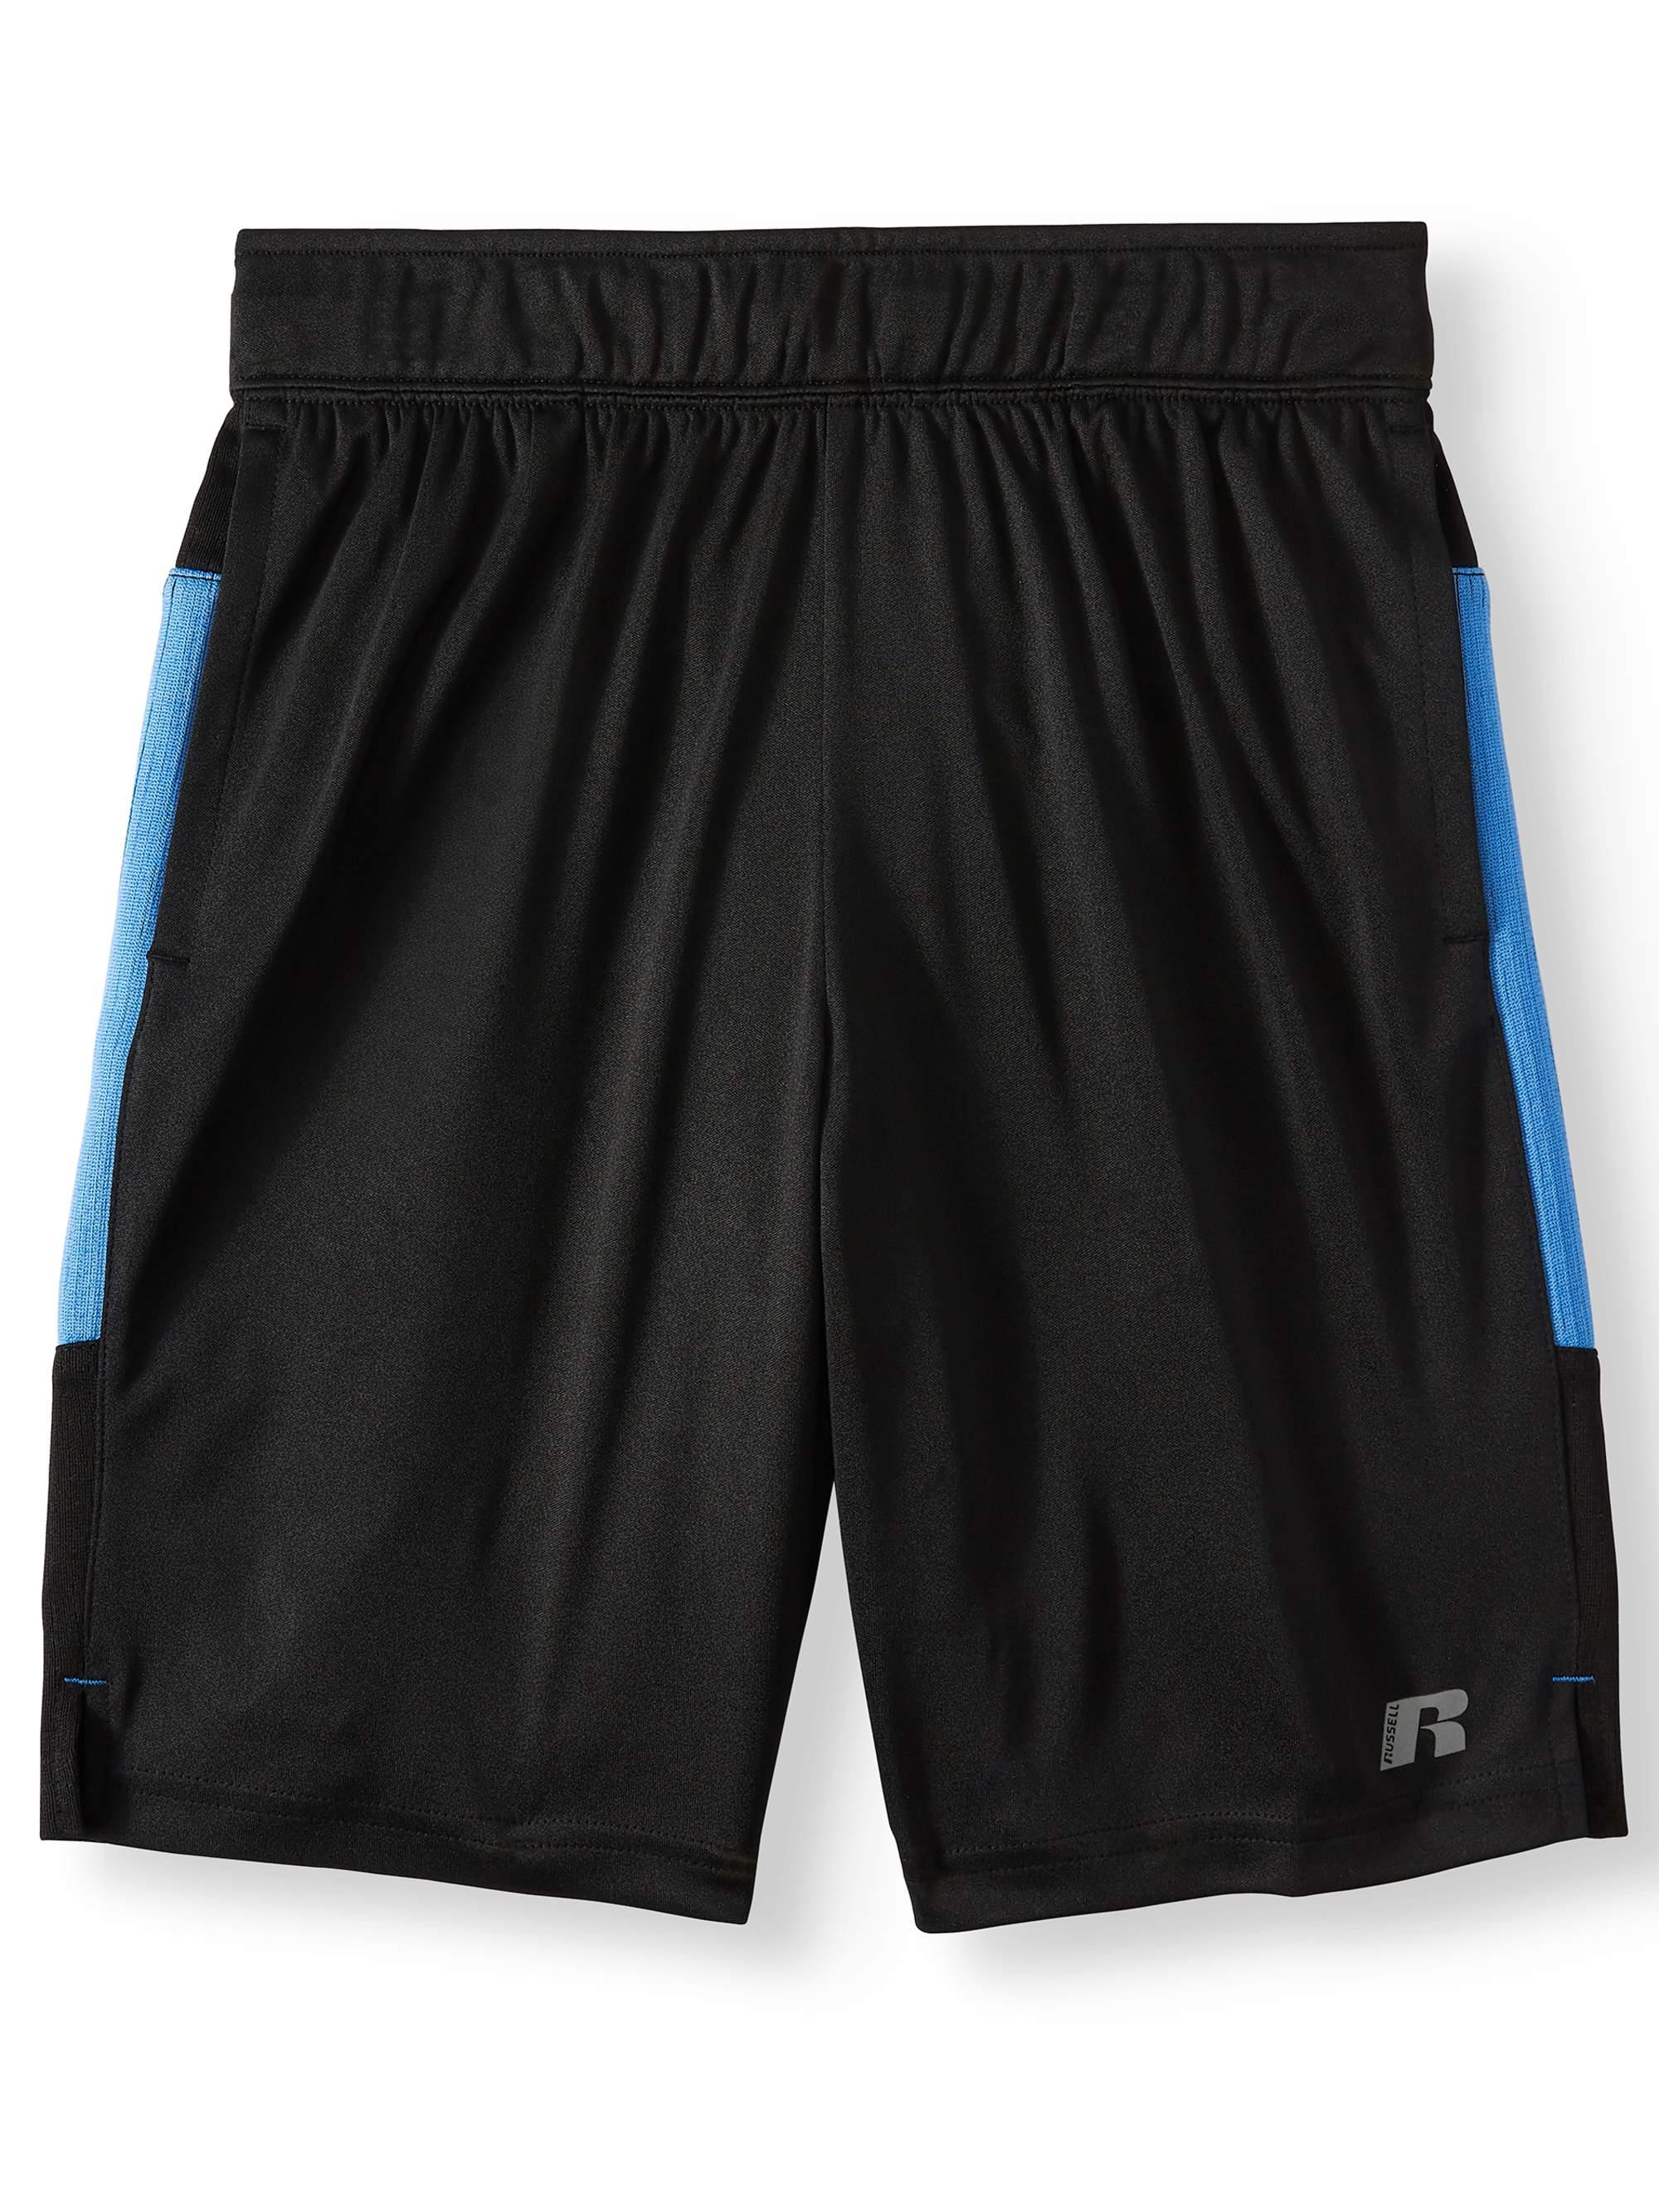 Boys' Mesh Insert Shorts